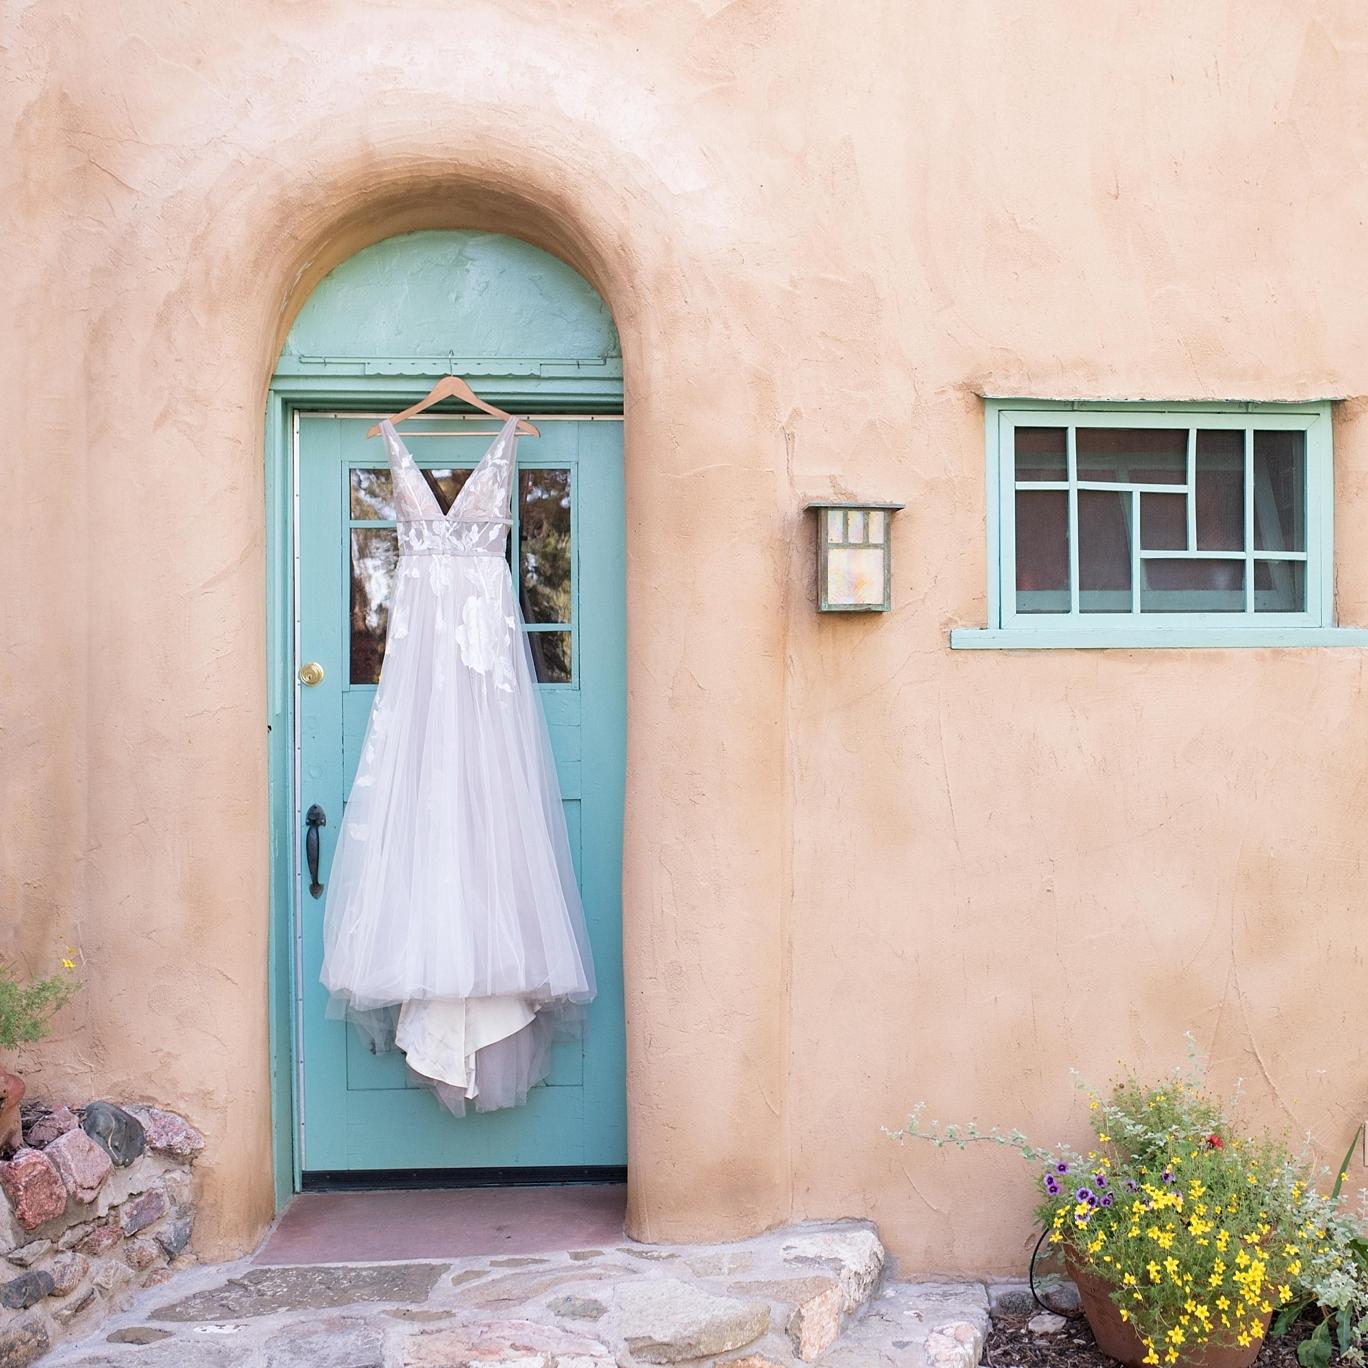 wedding dress hangs on turquoise door on adobe building in santa fe